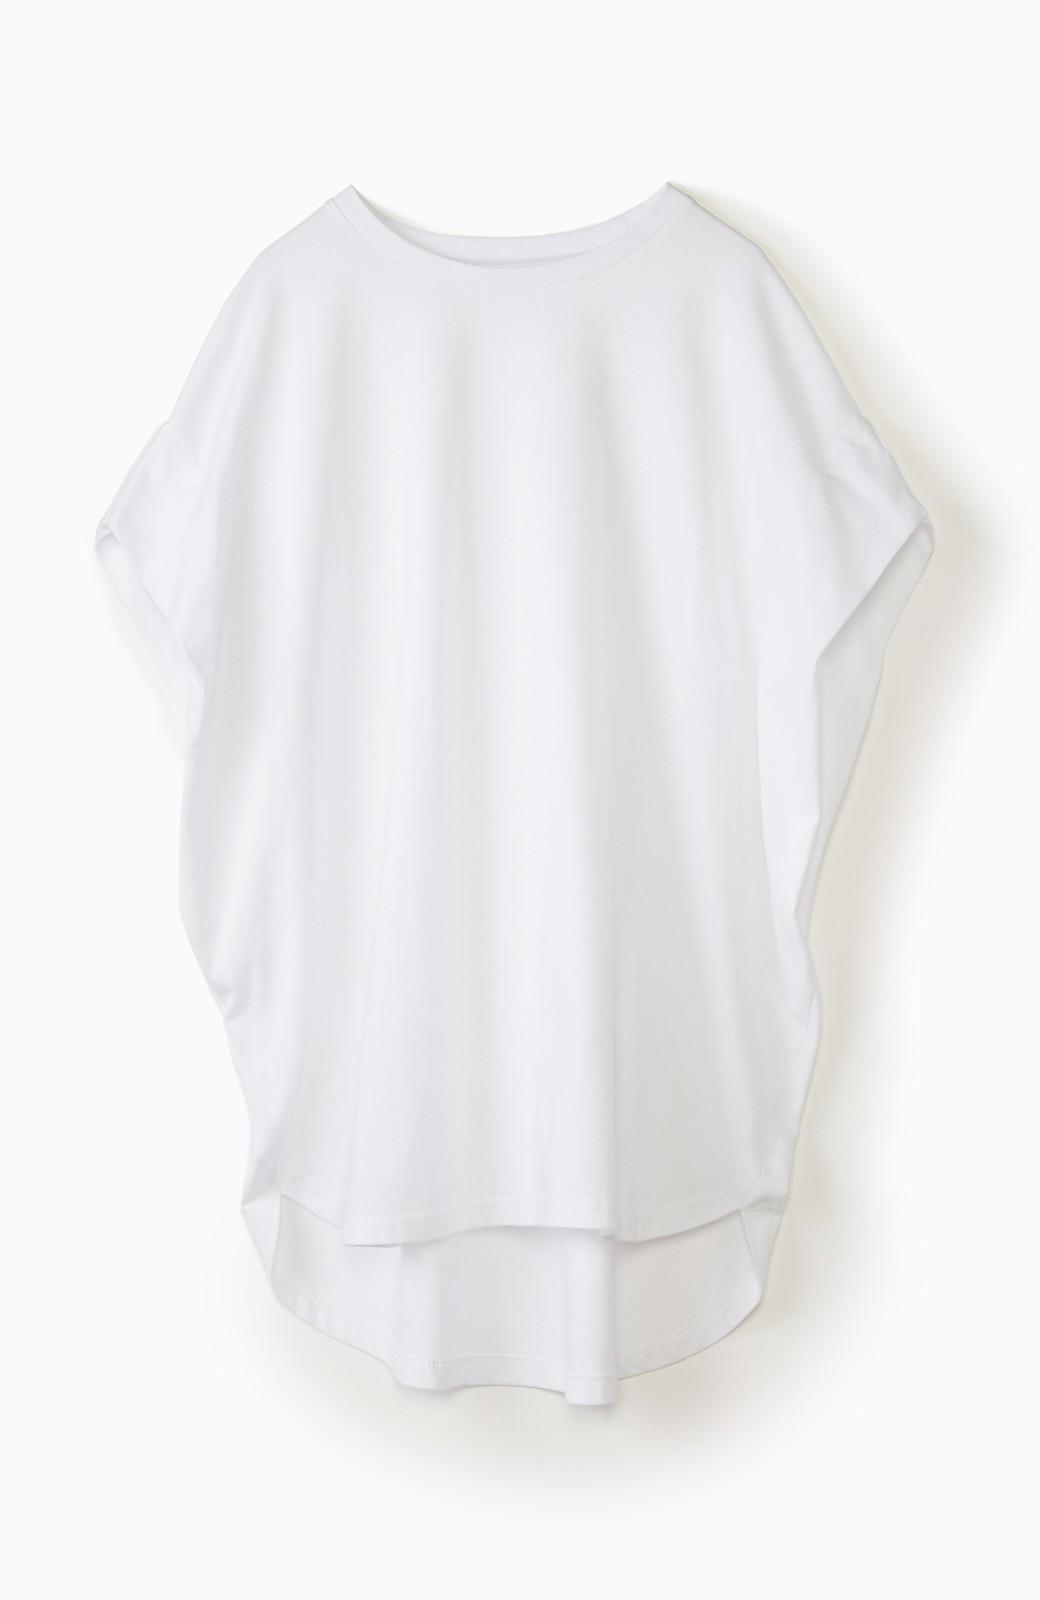 haco! PBPオーガニックコットン 楽ちんなのにブラウス気分で着られる大人のおめかしTシャツ <ホワイト>の商品写真28